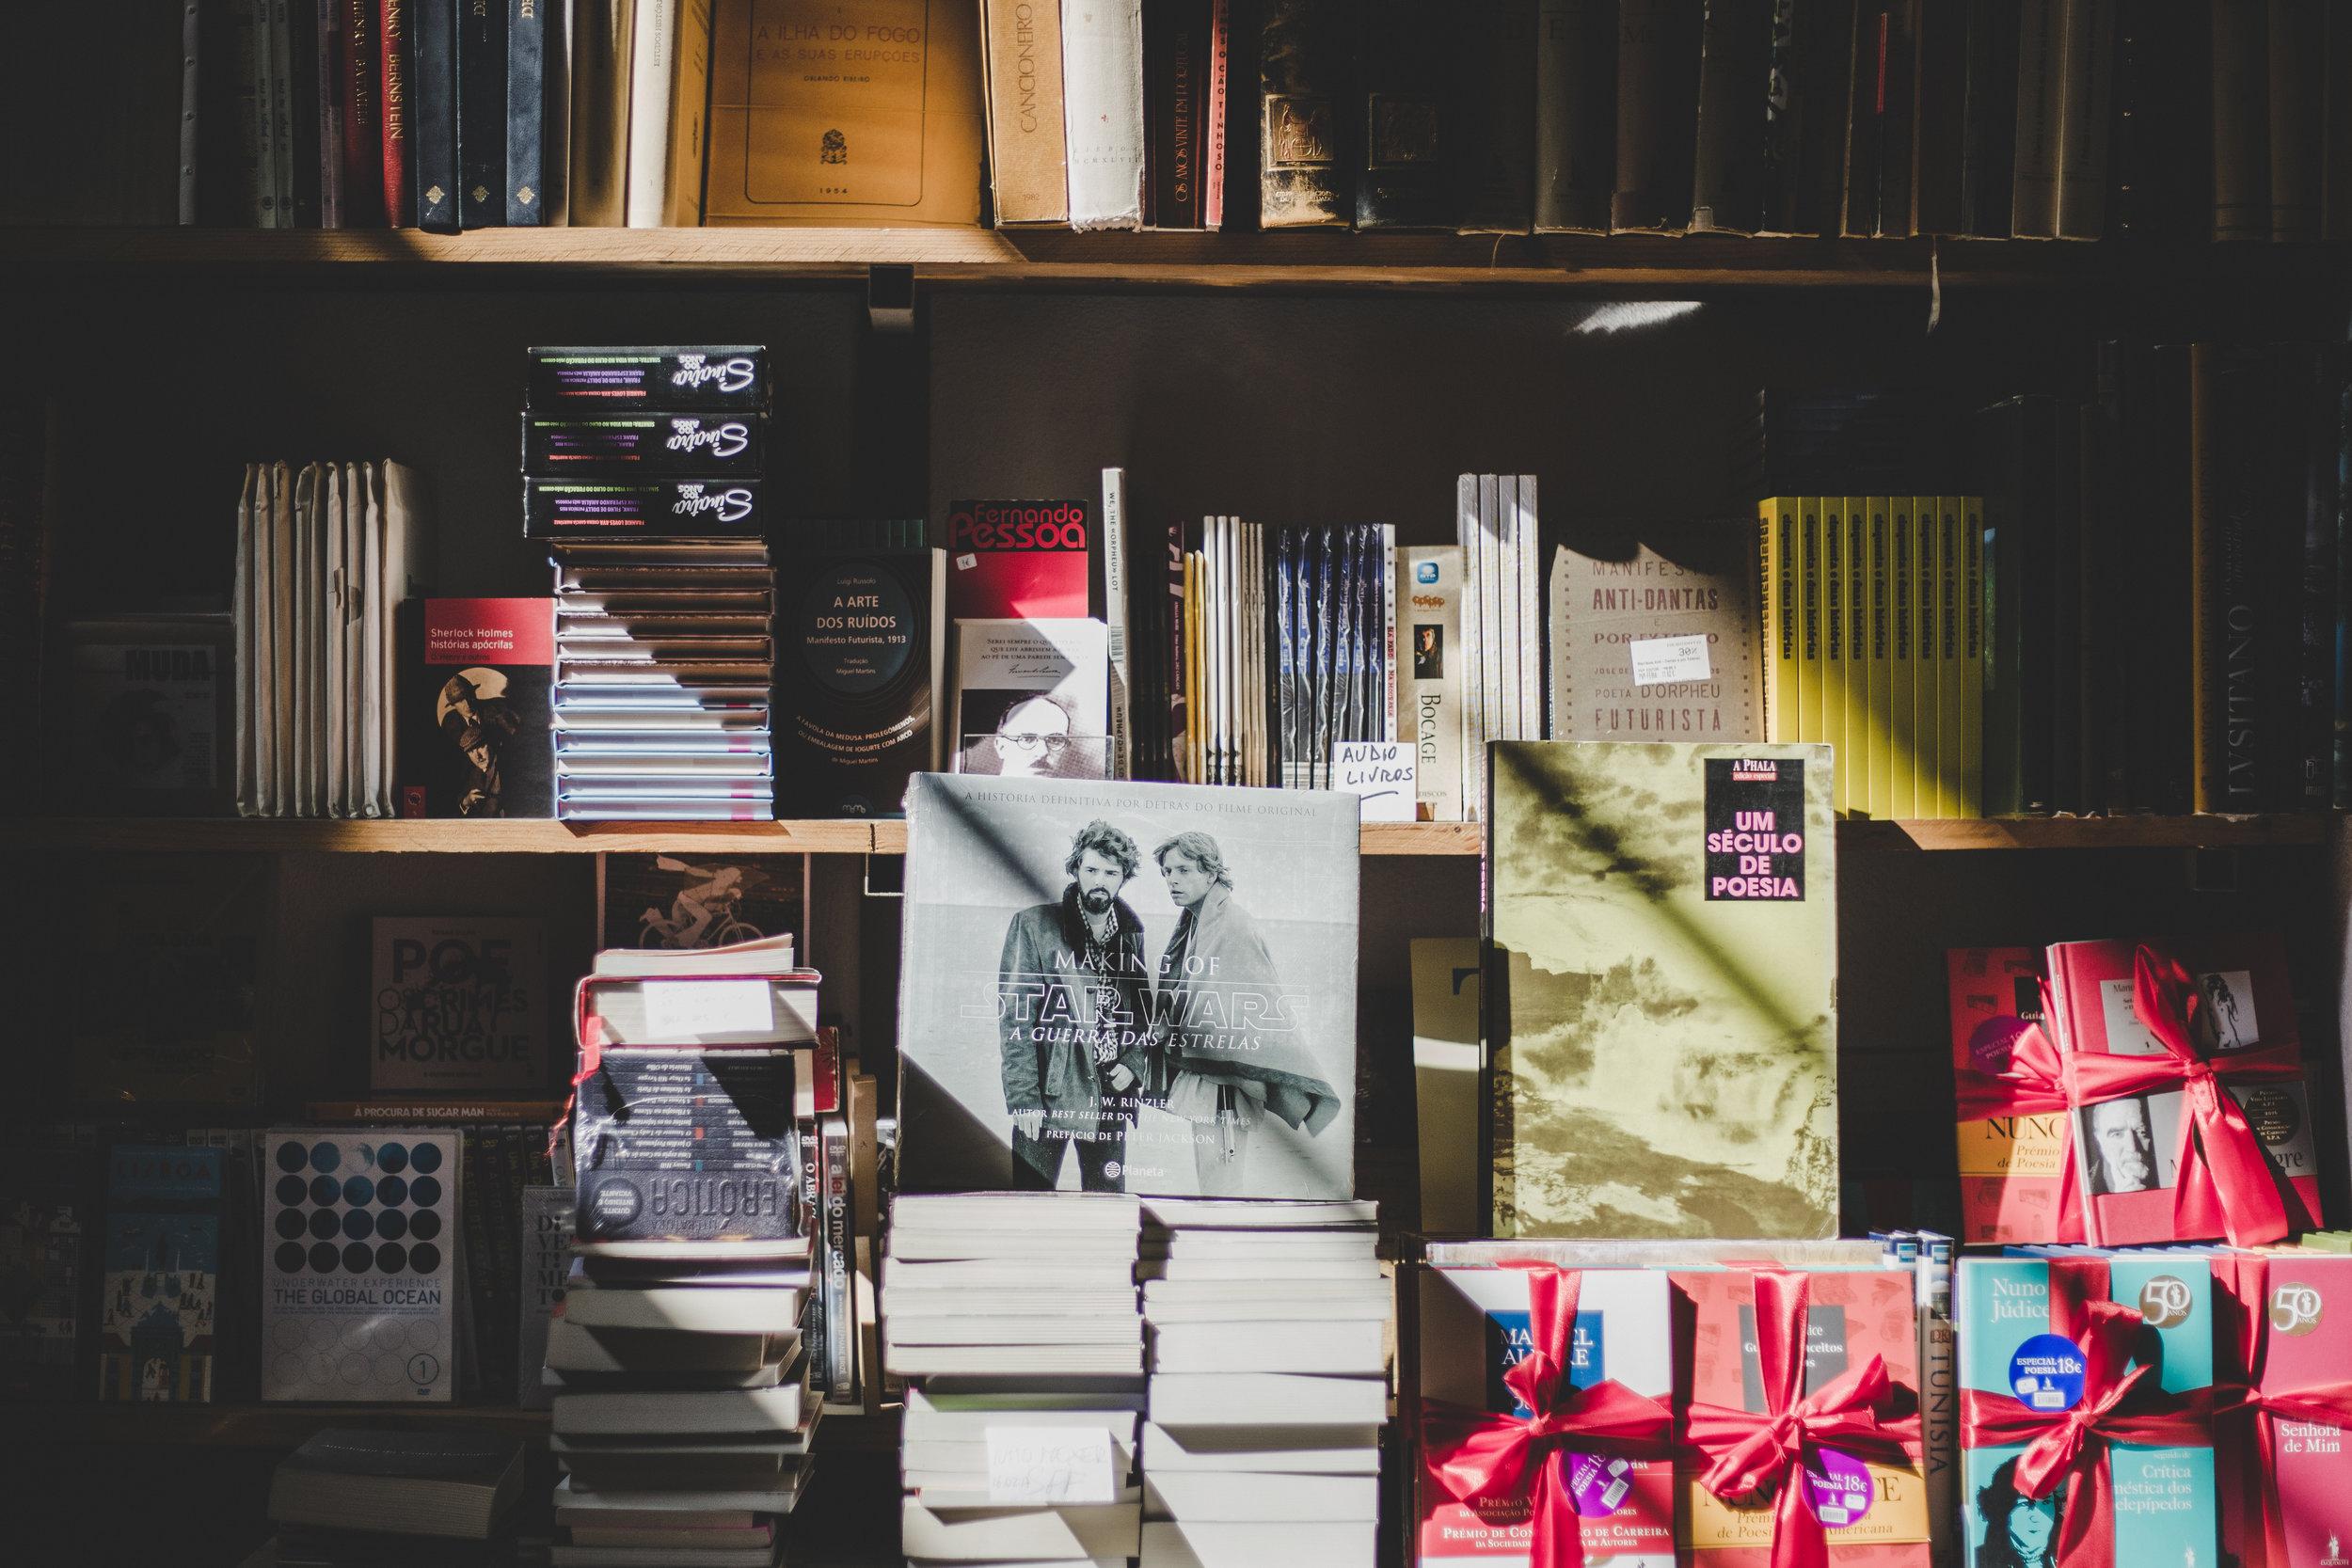 Books and sunshine :)